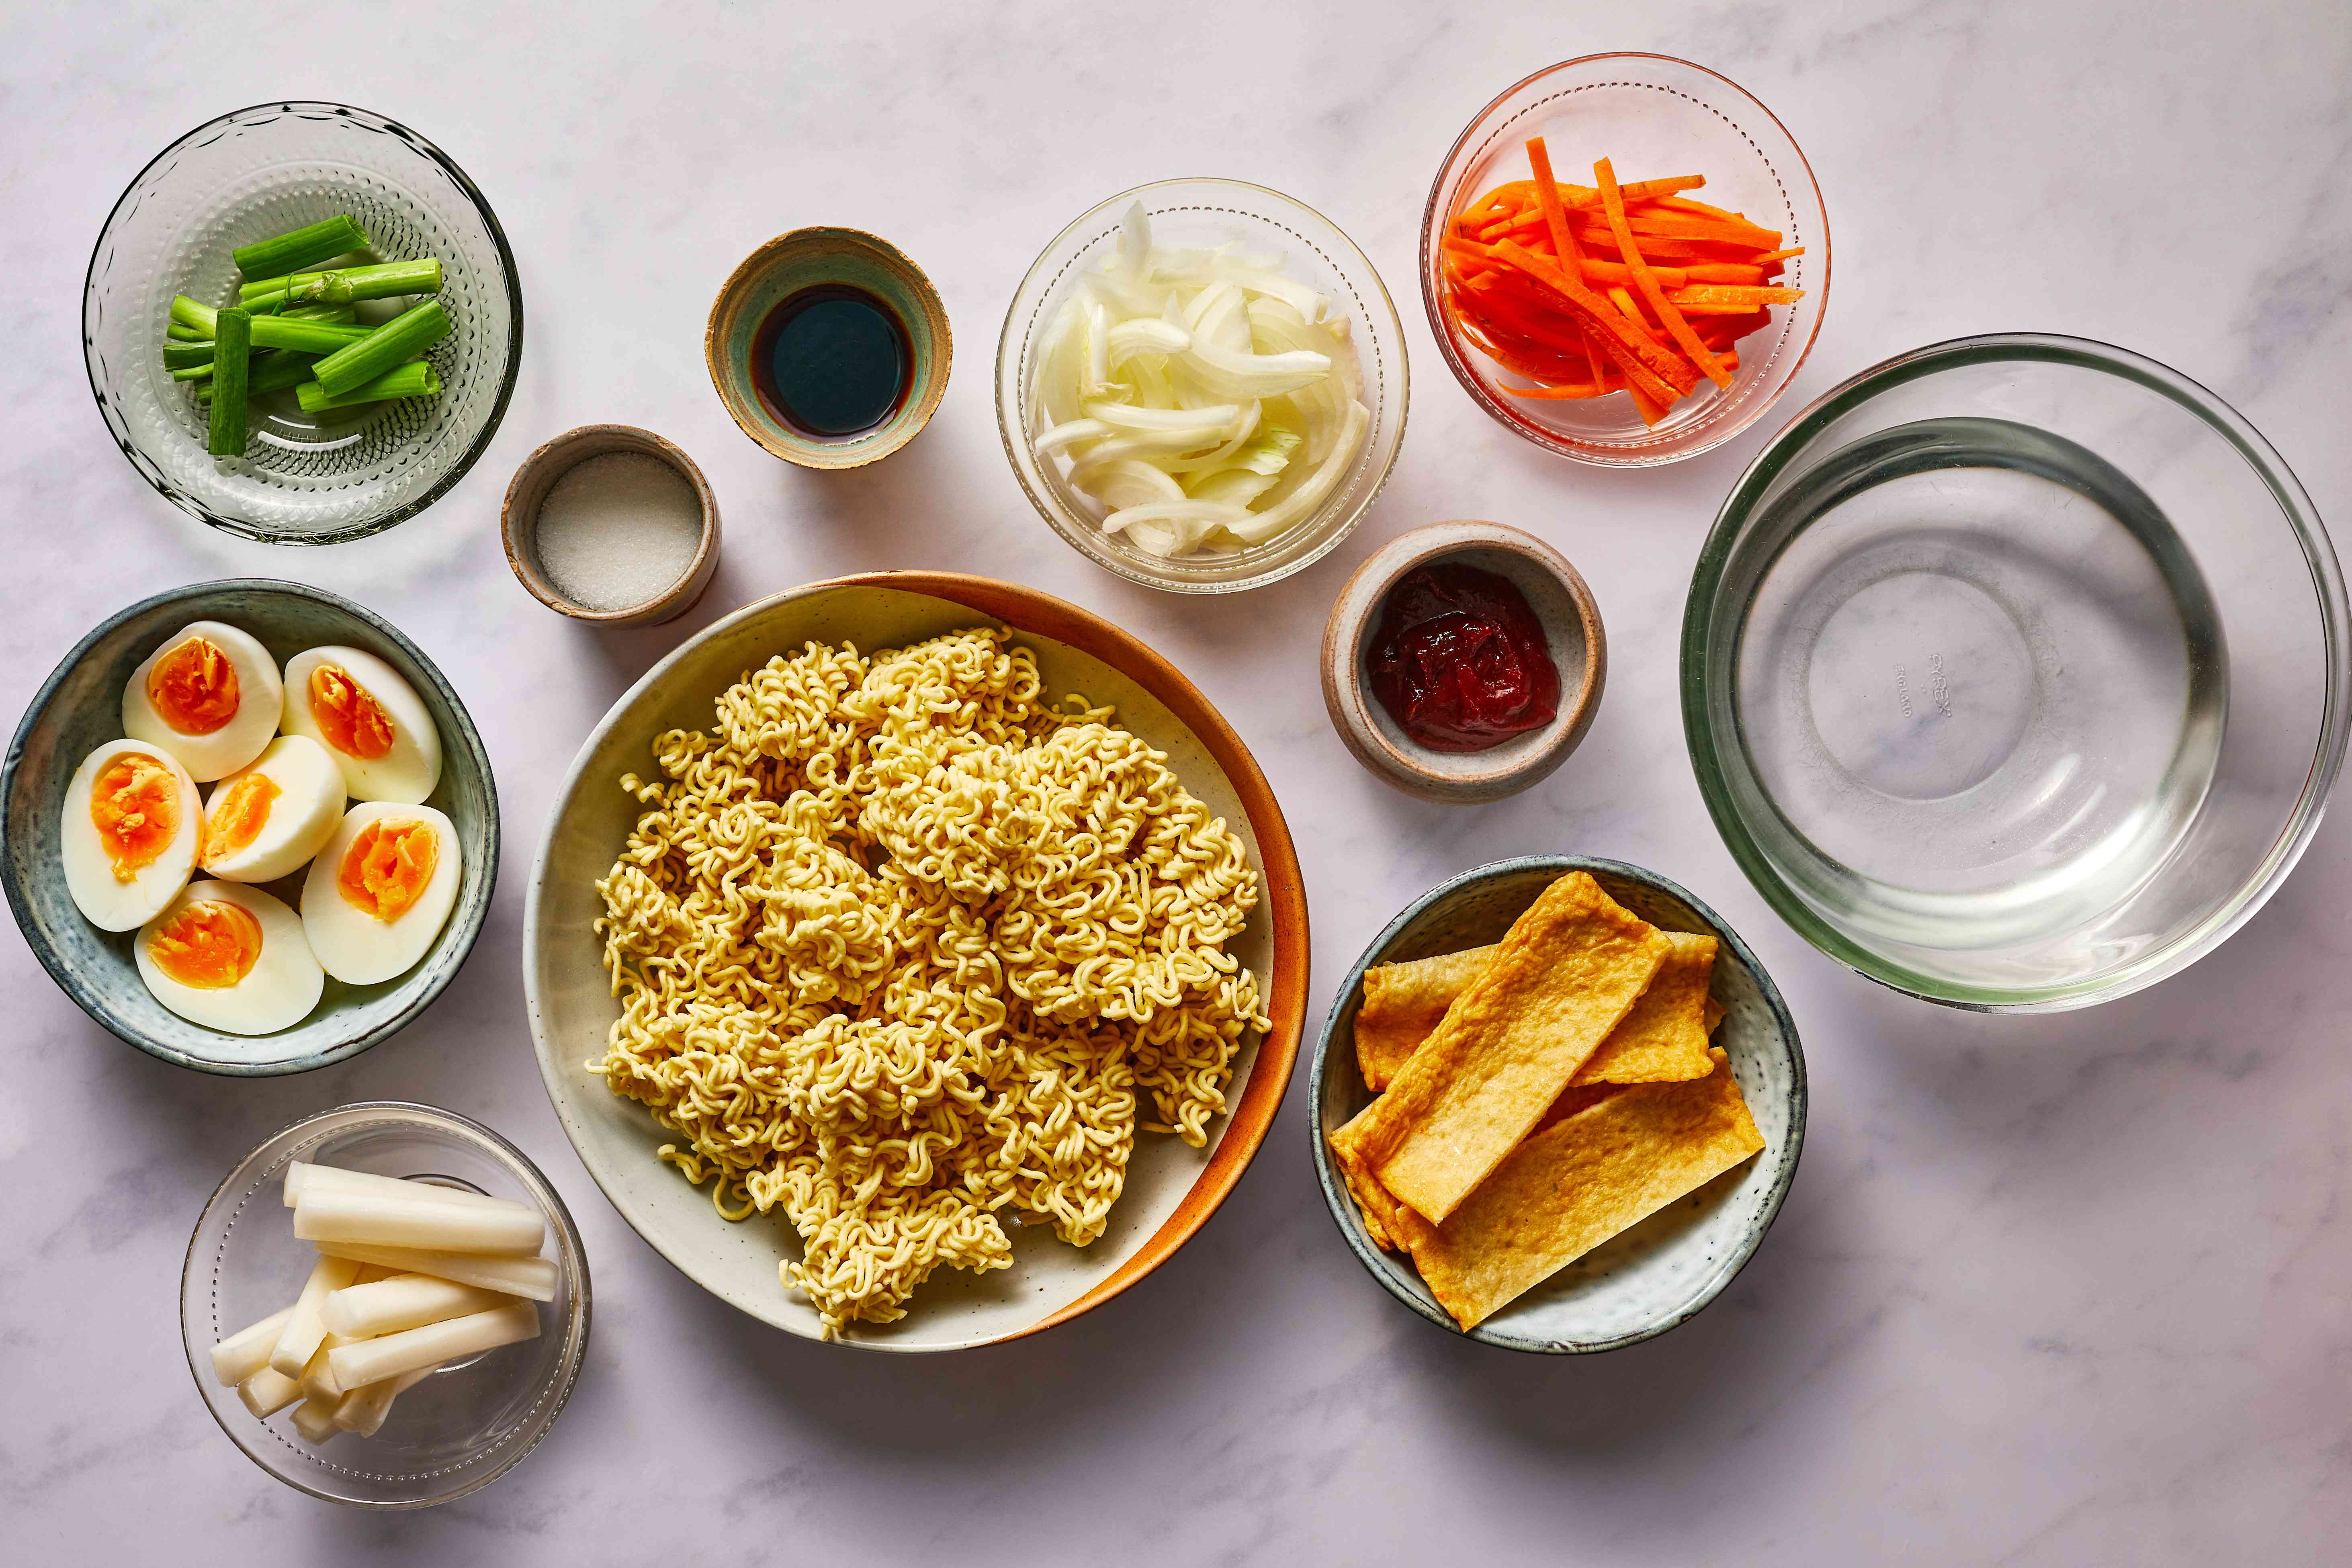 Rabokki (Ramen + Dukboki), the Ultimate Korean Street Food ingredients